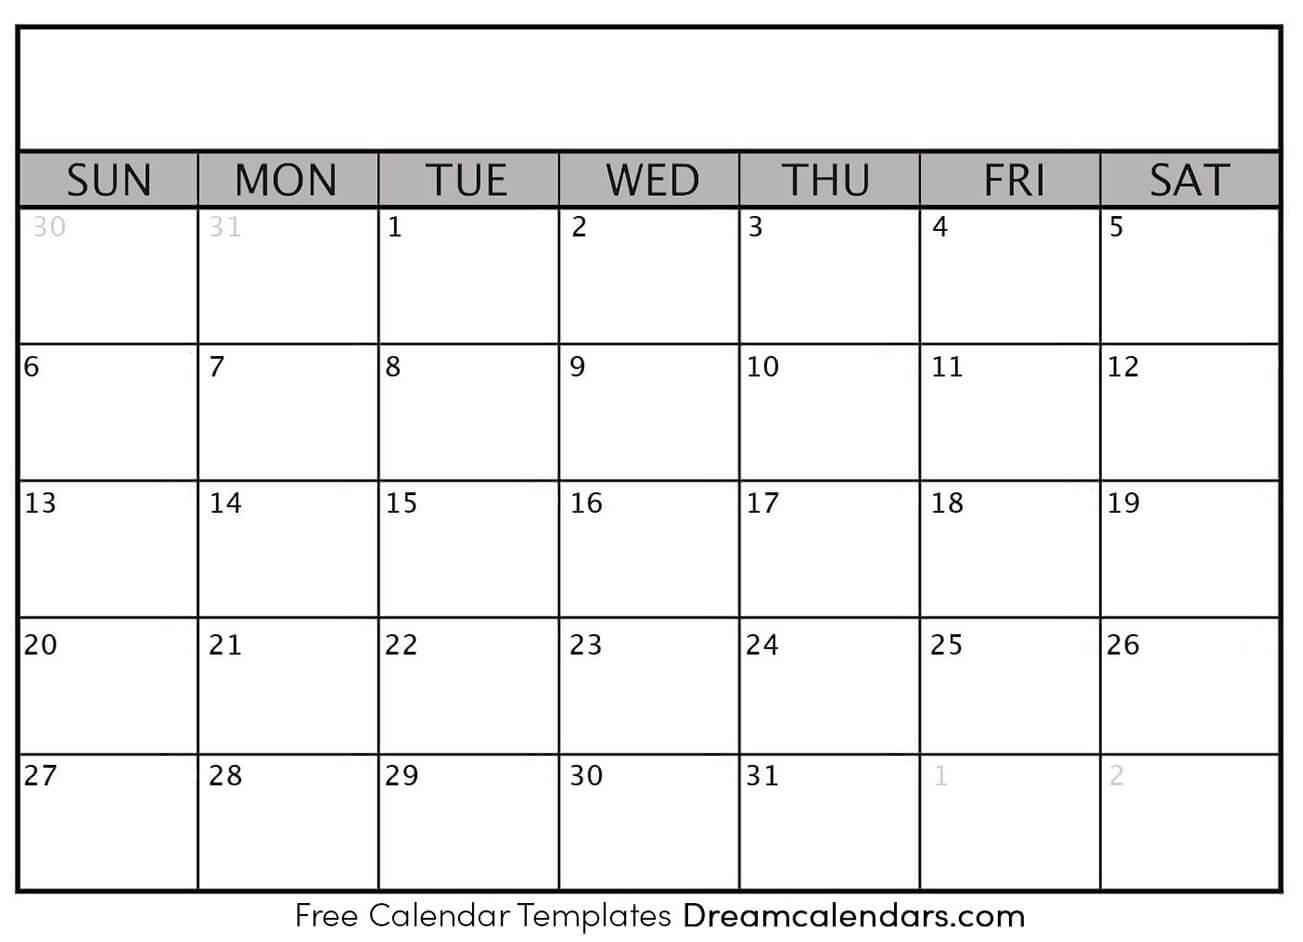 Ko-Fi - Blank Printable Calendar Templates - Ko-Fi ❤️ Where pertaining to Printable Blank Calendar Template